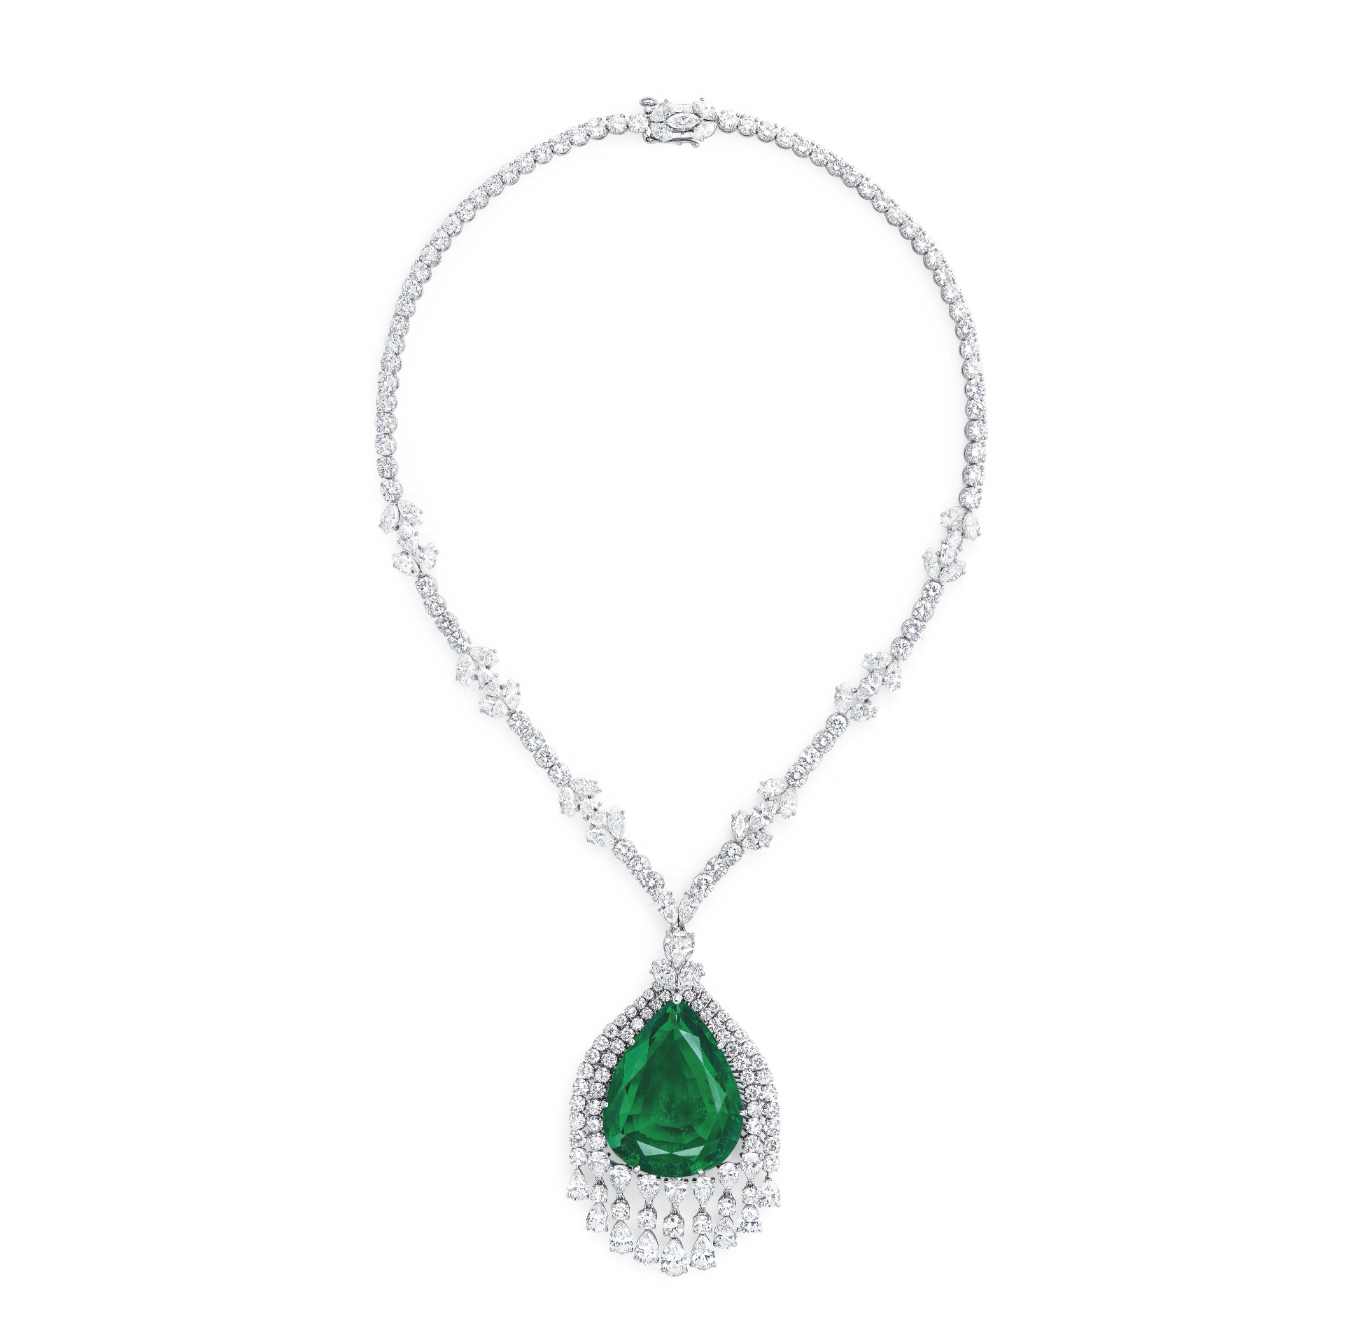 Le pendentif émeraude qui sera vendu chez Christie's le 15 mai, image © Christie's